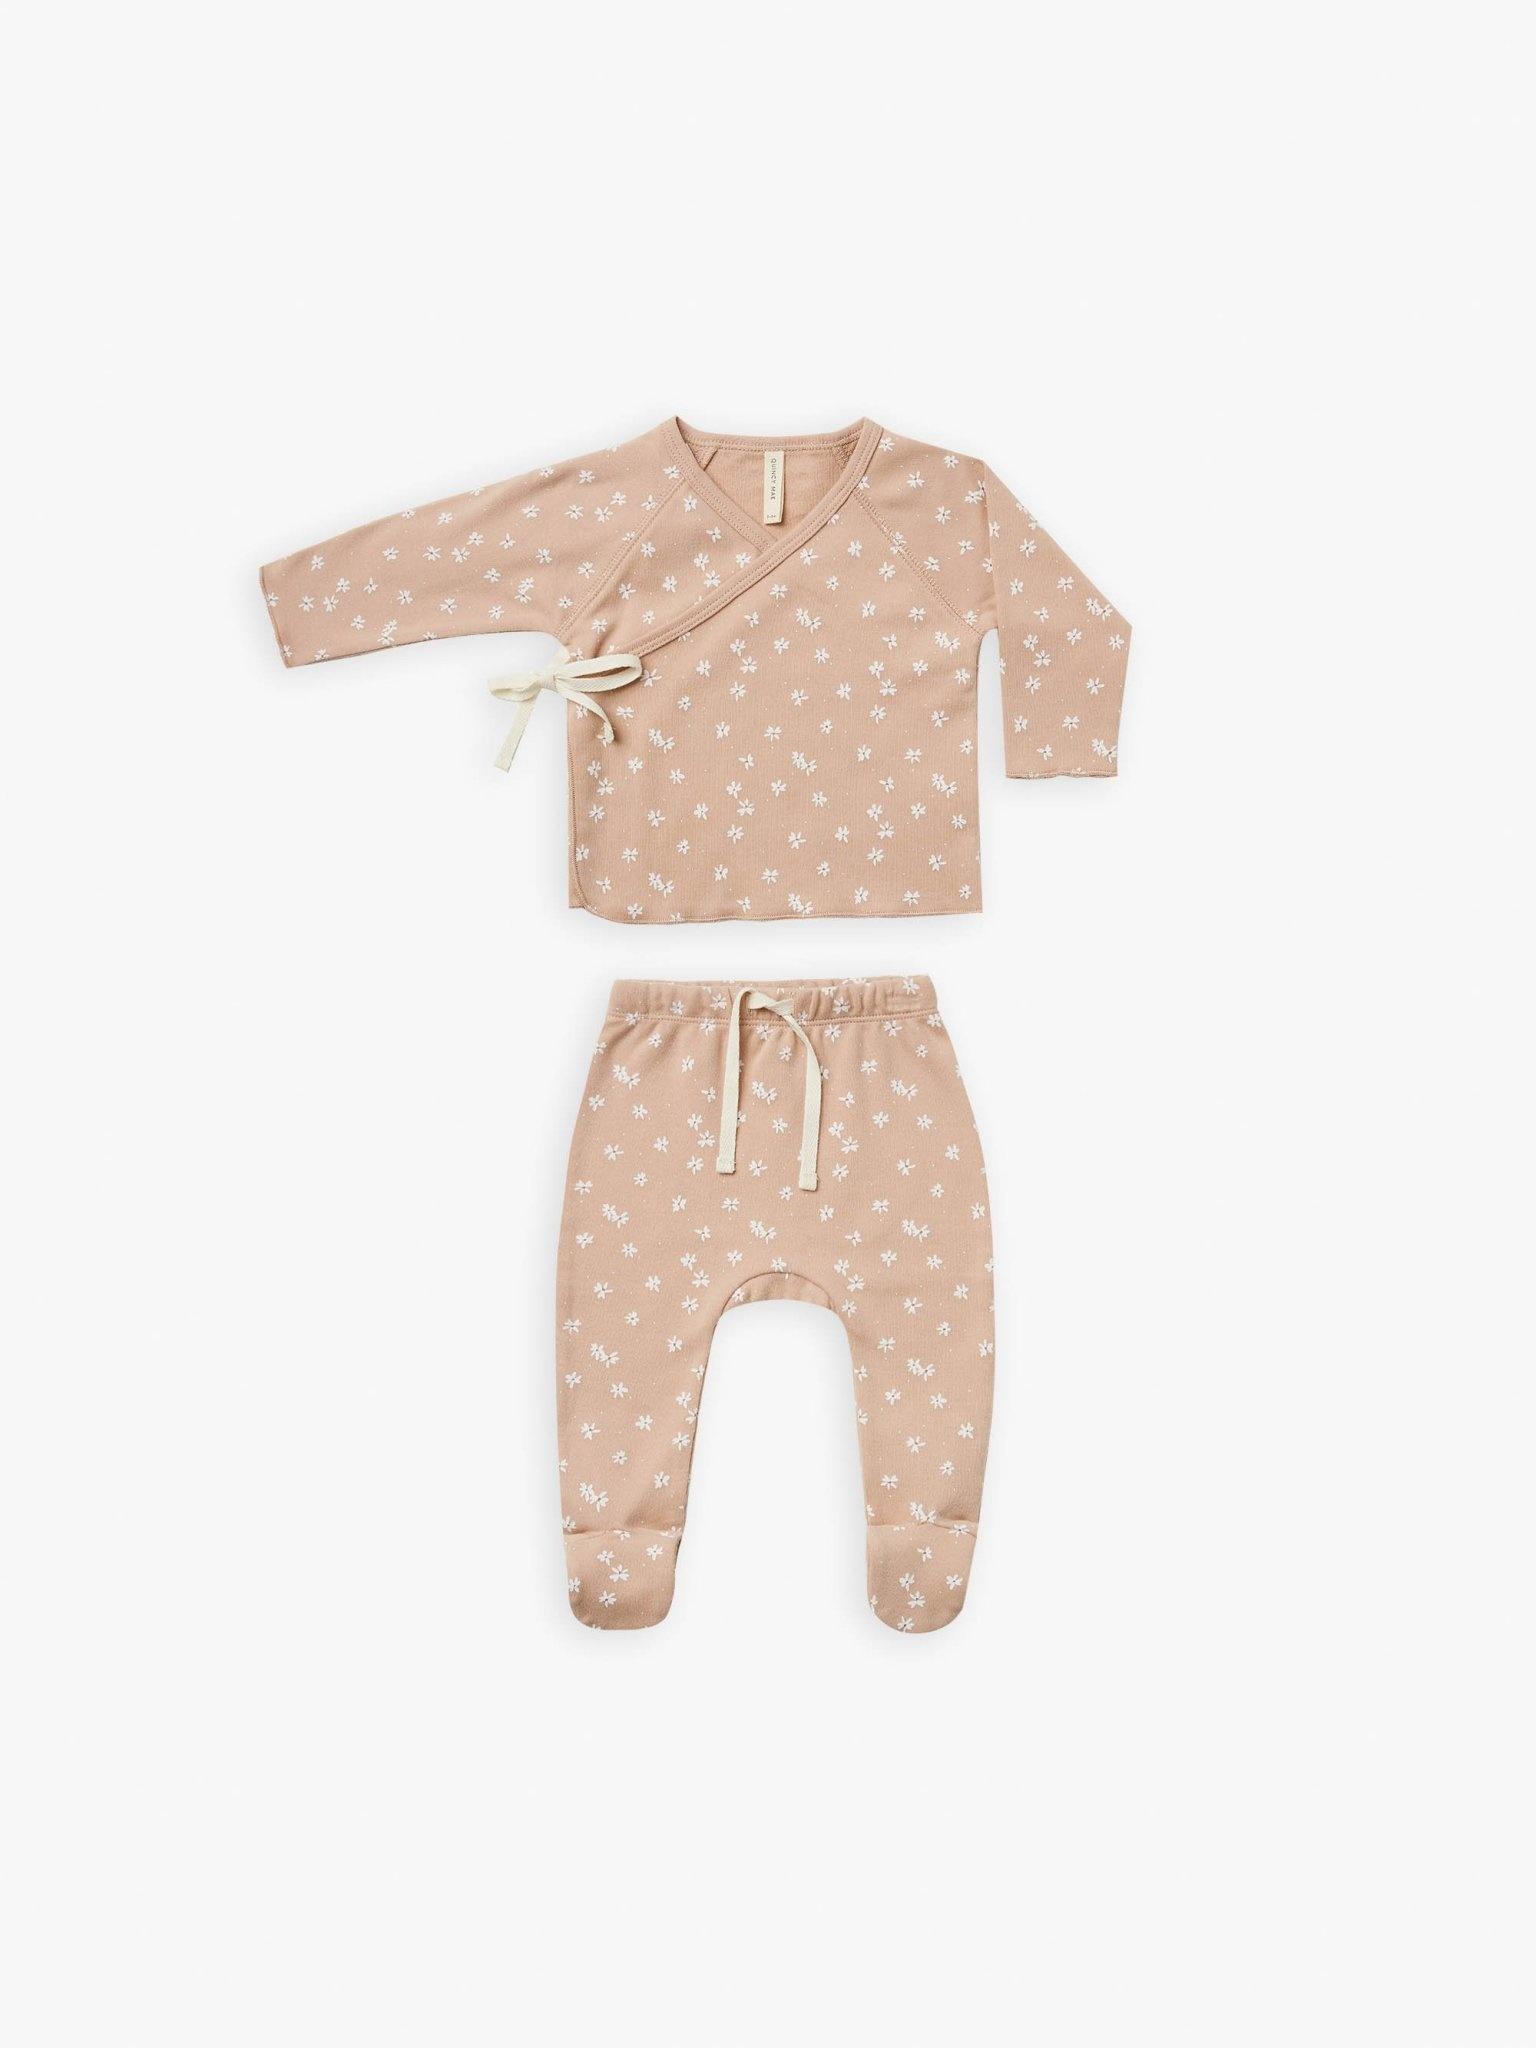 Quincy Mae Quincy Mae | Wrap Top + Pant Set Blossom Petal